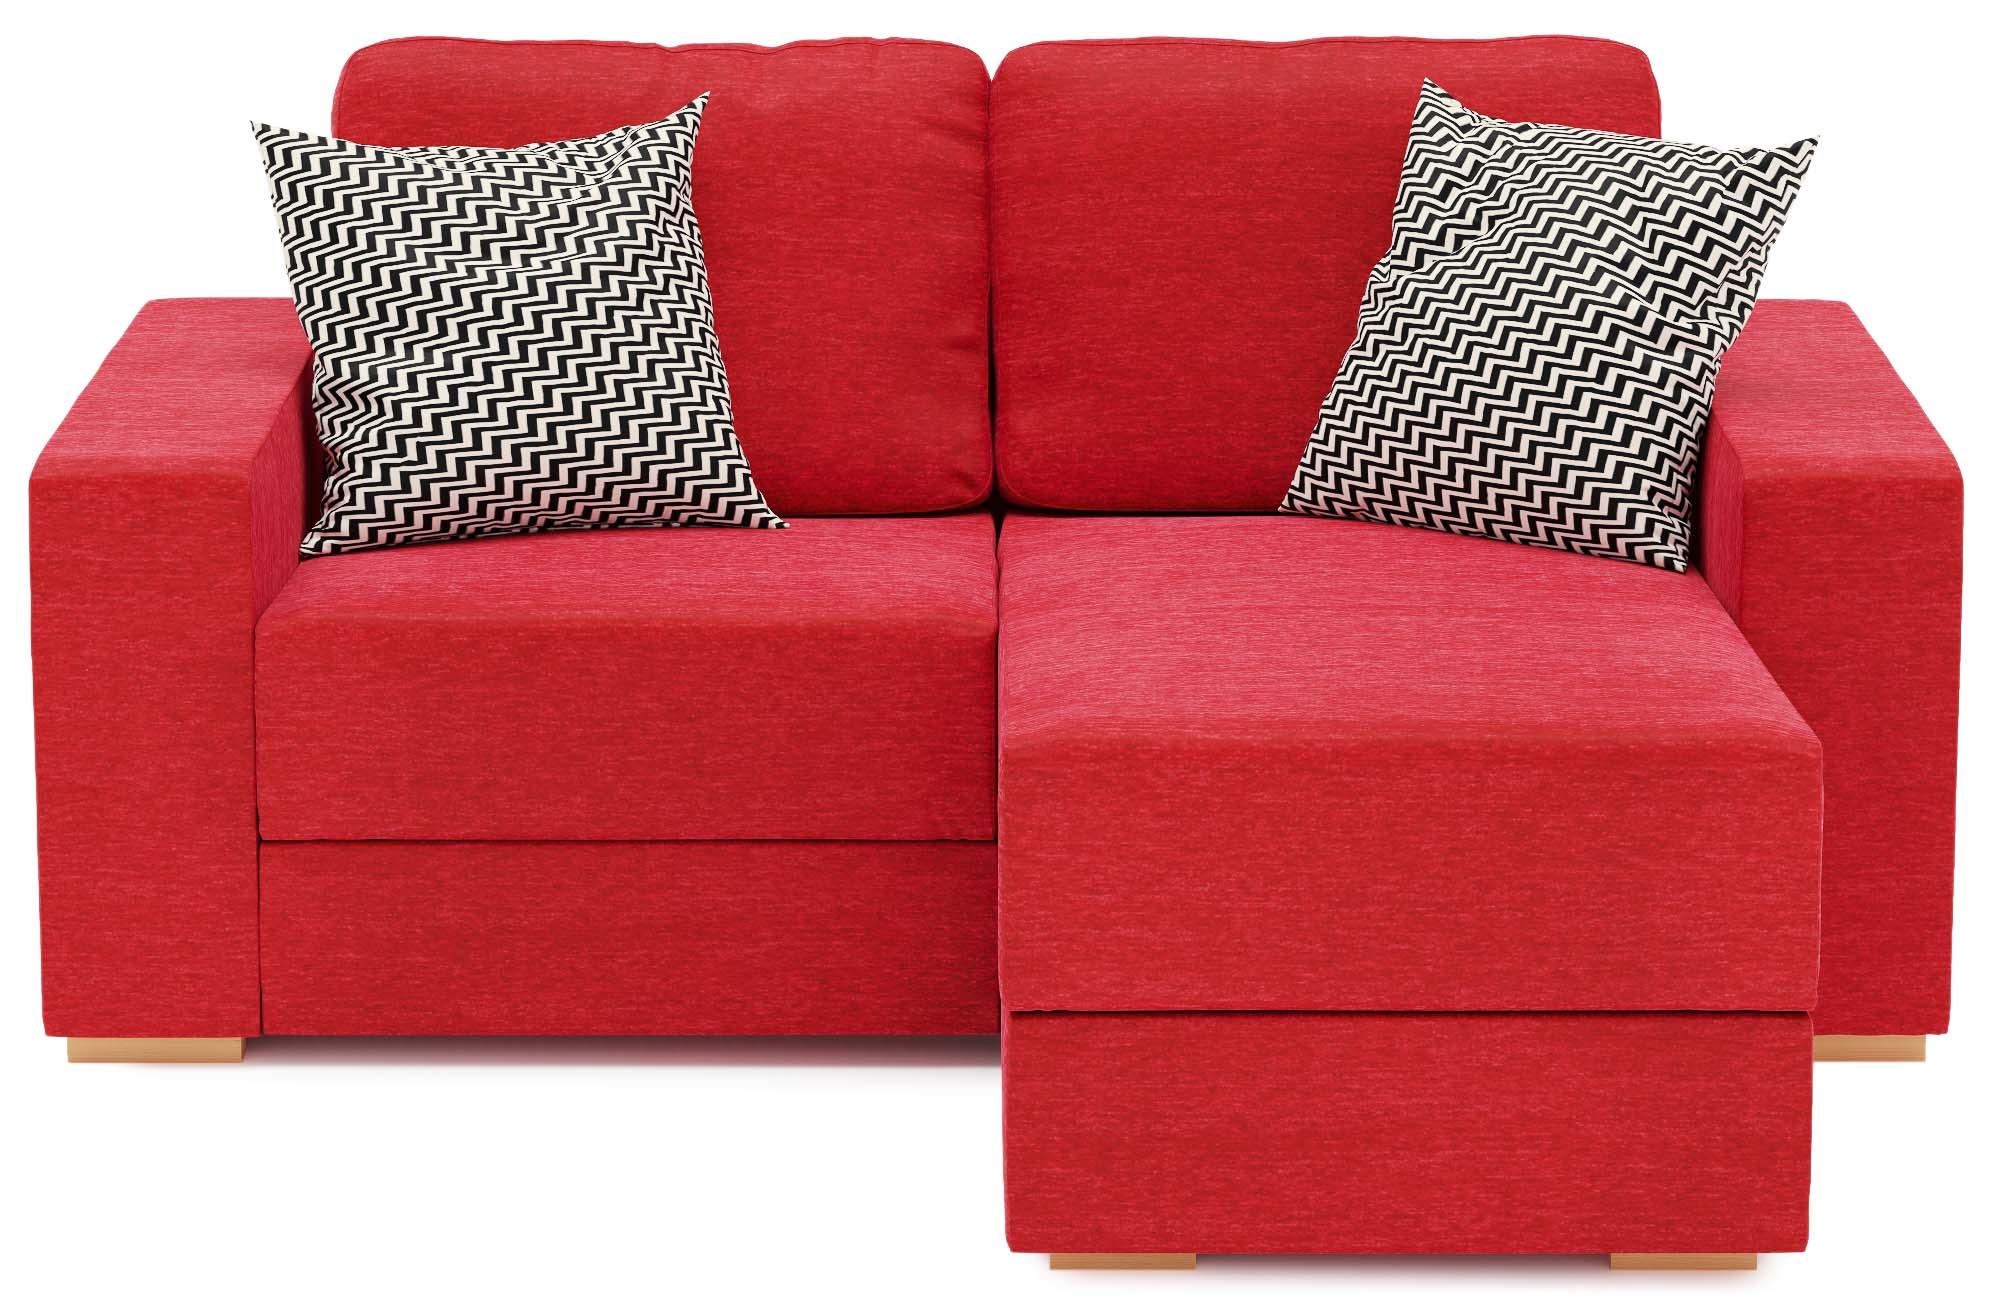 Holl 2 Seat Compact Chaise Corner Sofa Nabru